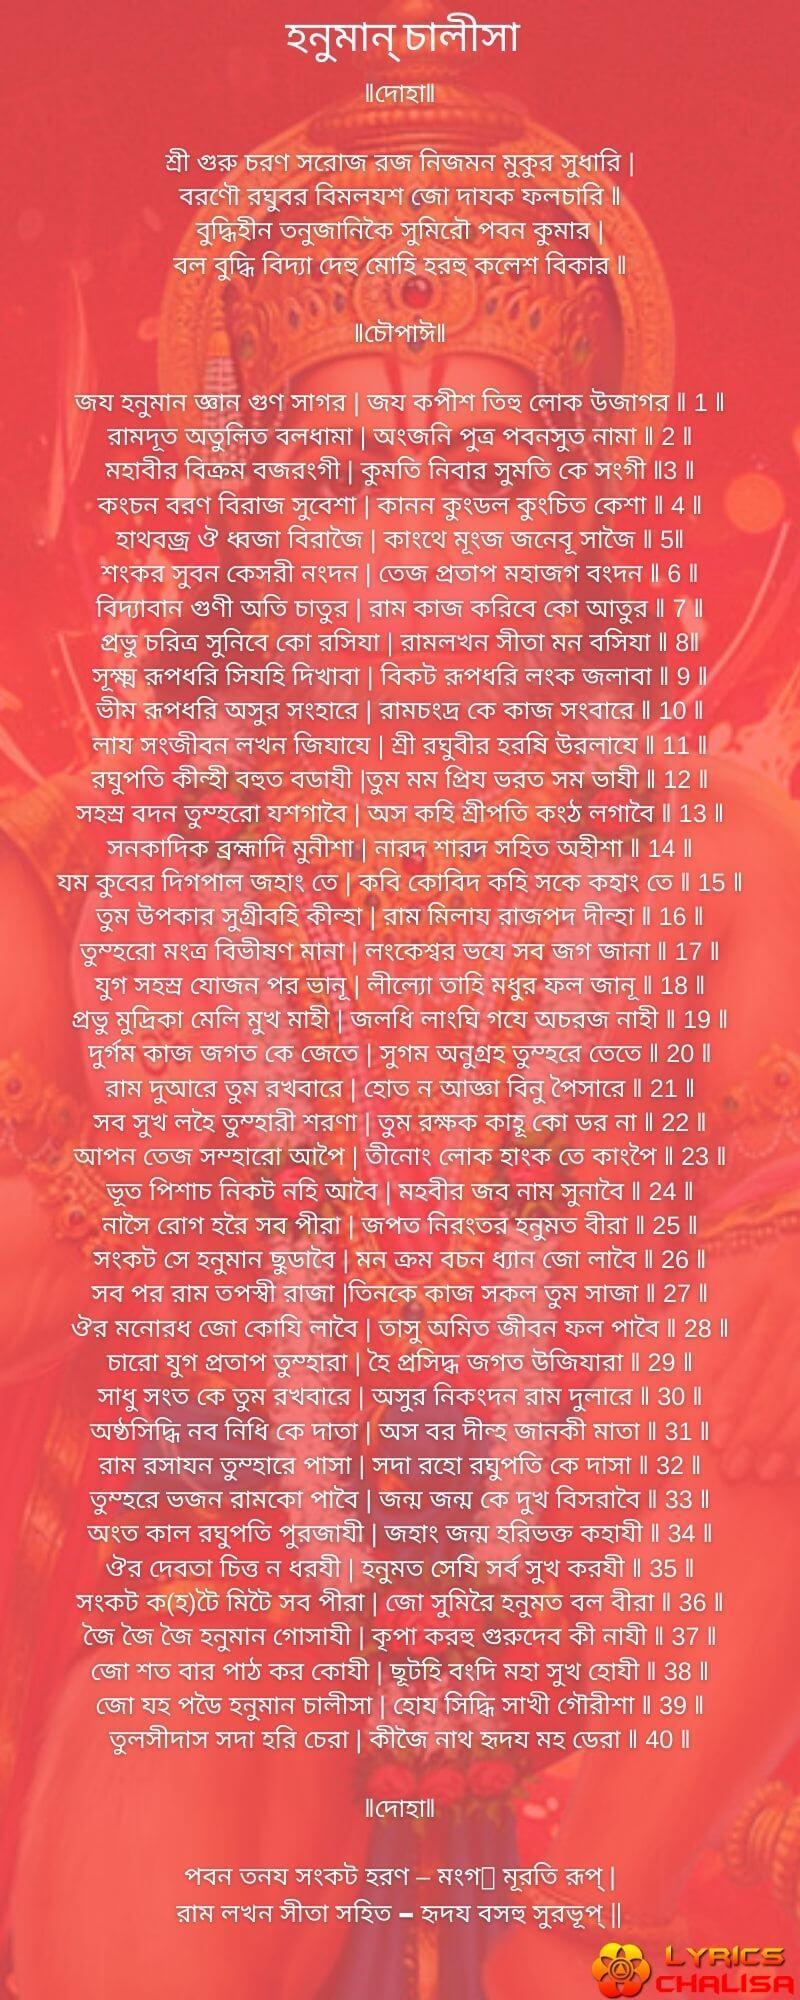 Shree Hanuman Chalisa Lyrics In bengali With PDF